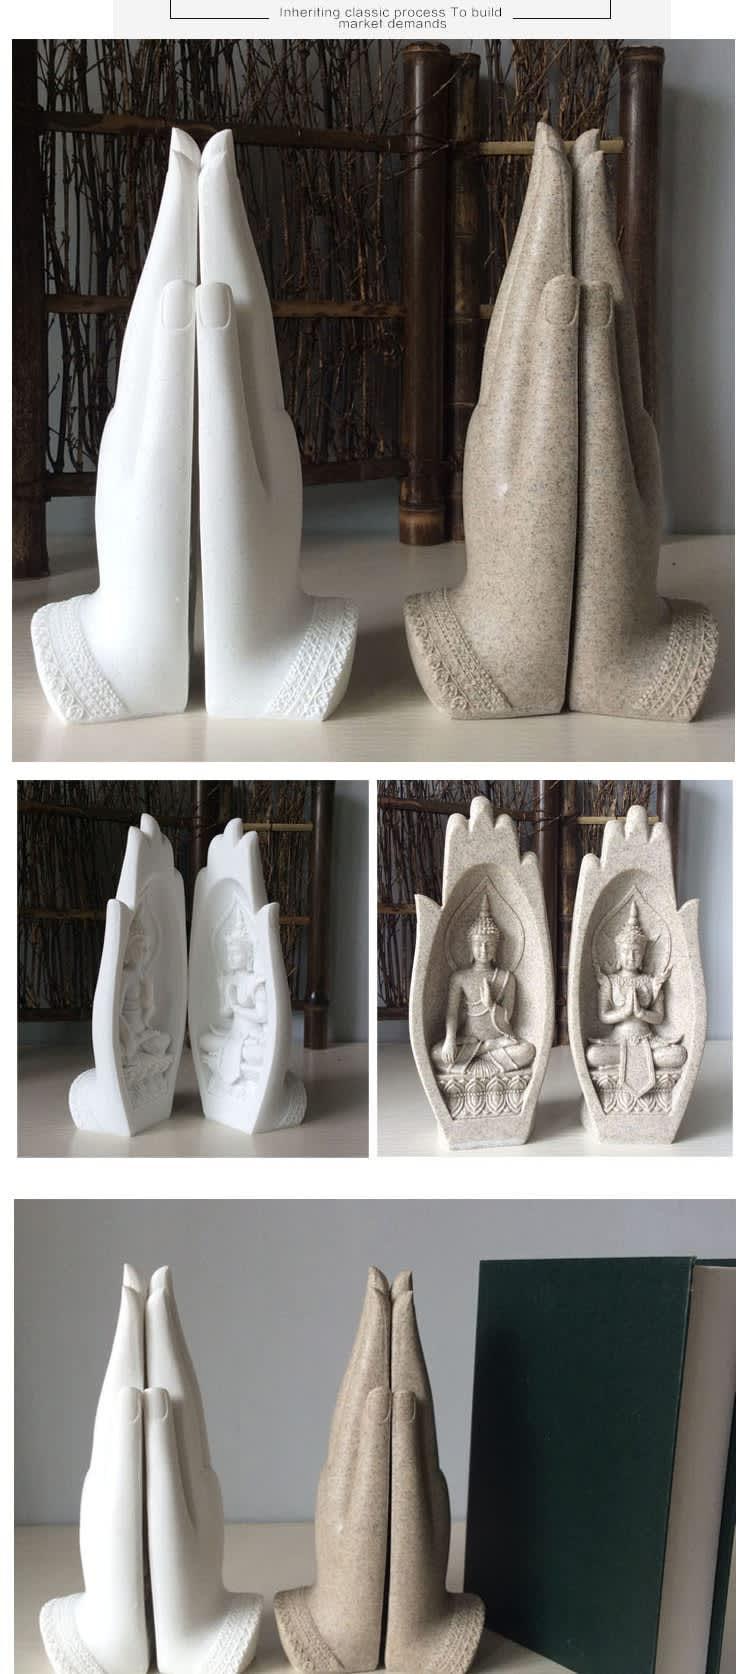 Estatua de Buda para decoración del hogar, figurita de monje, Tathagata, Yoga, Fengshui, India, 2 uds.